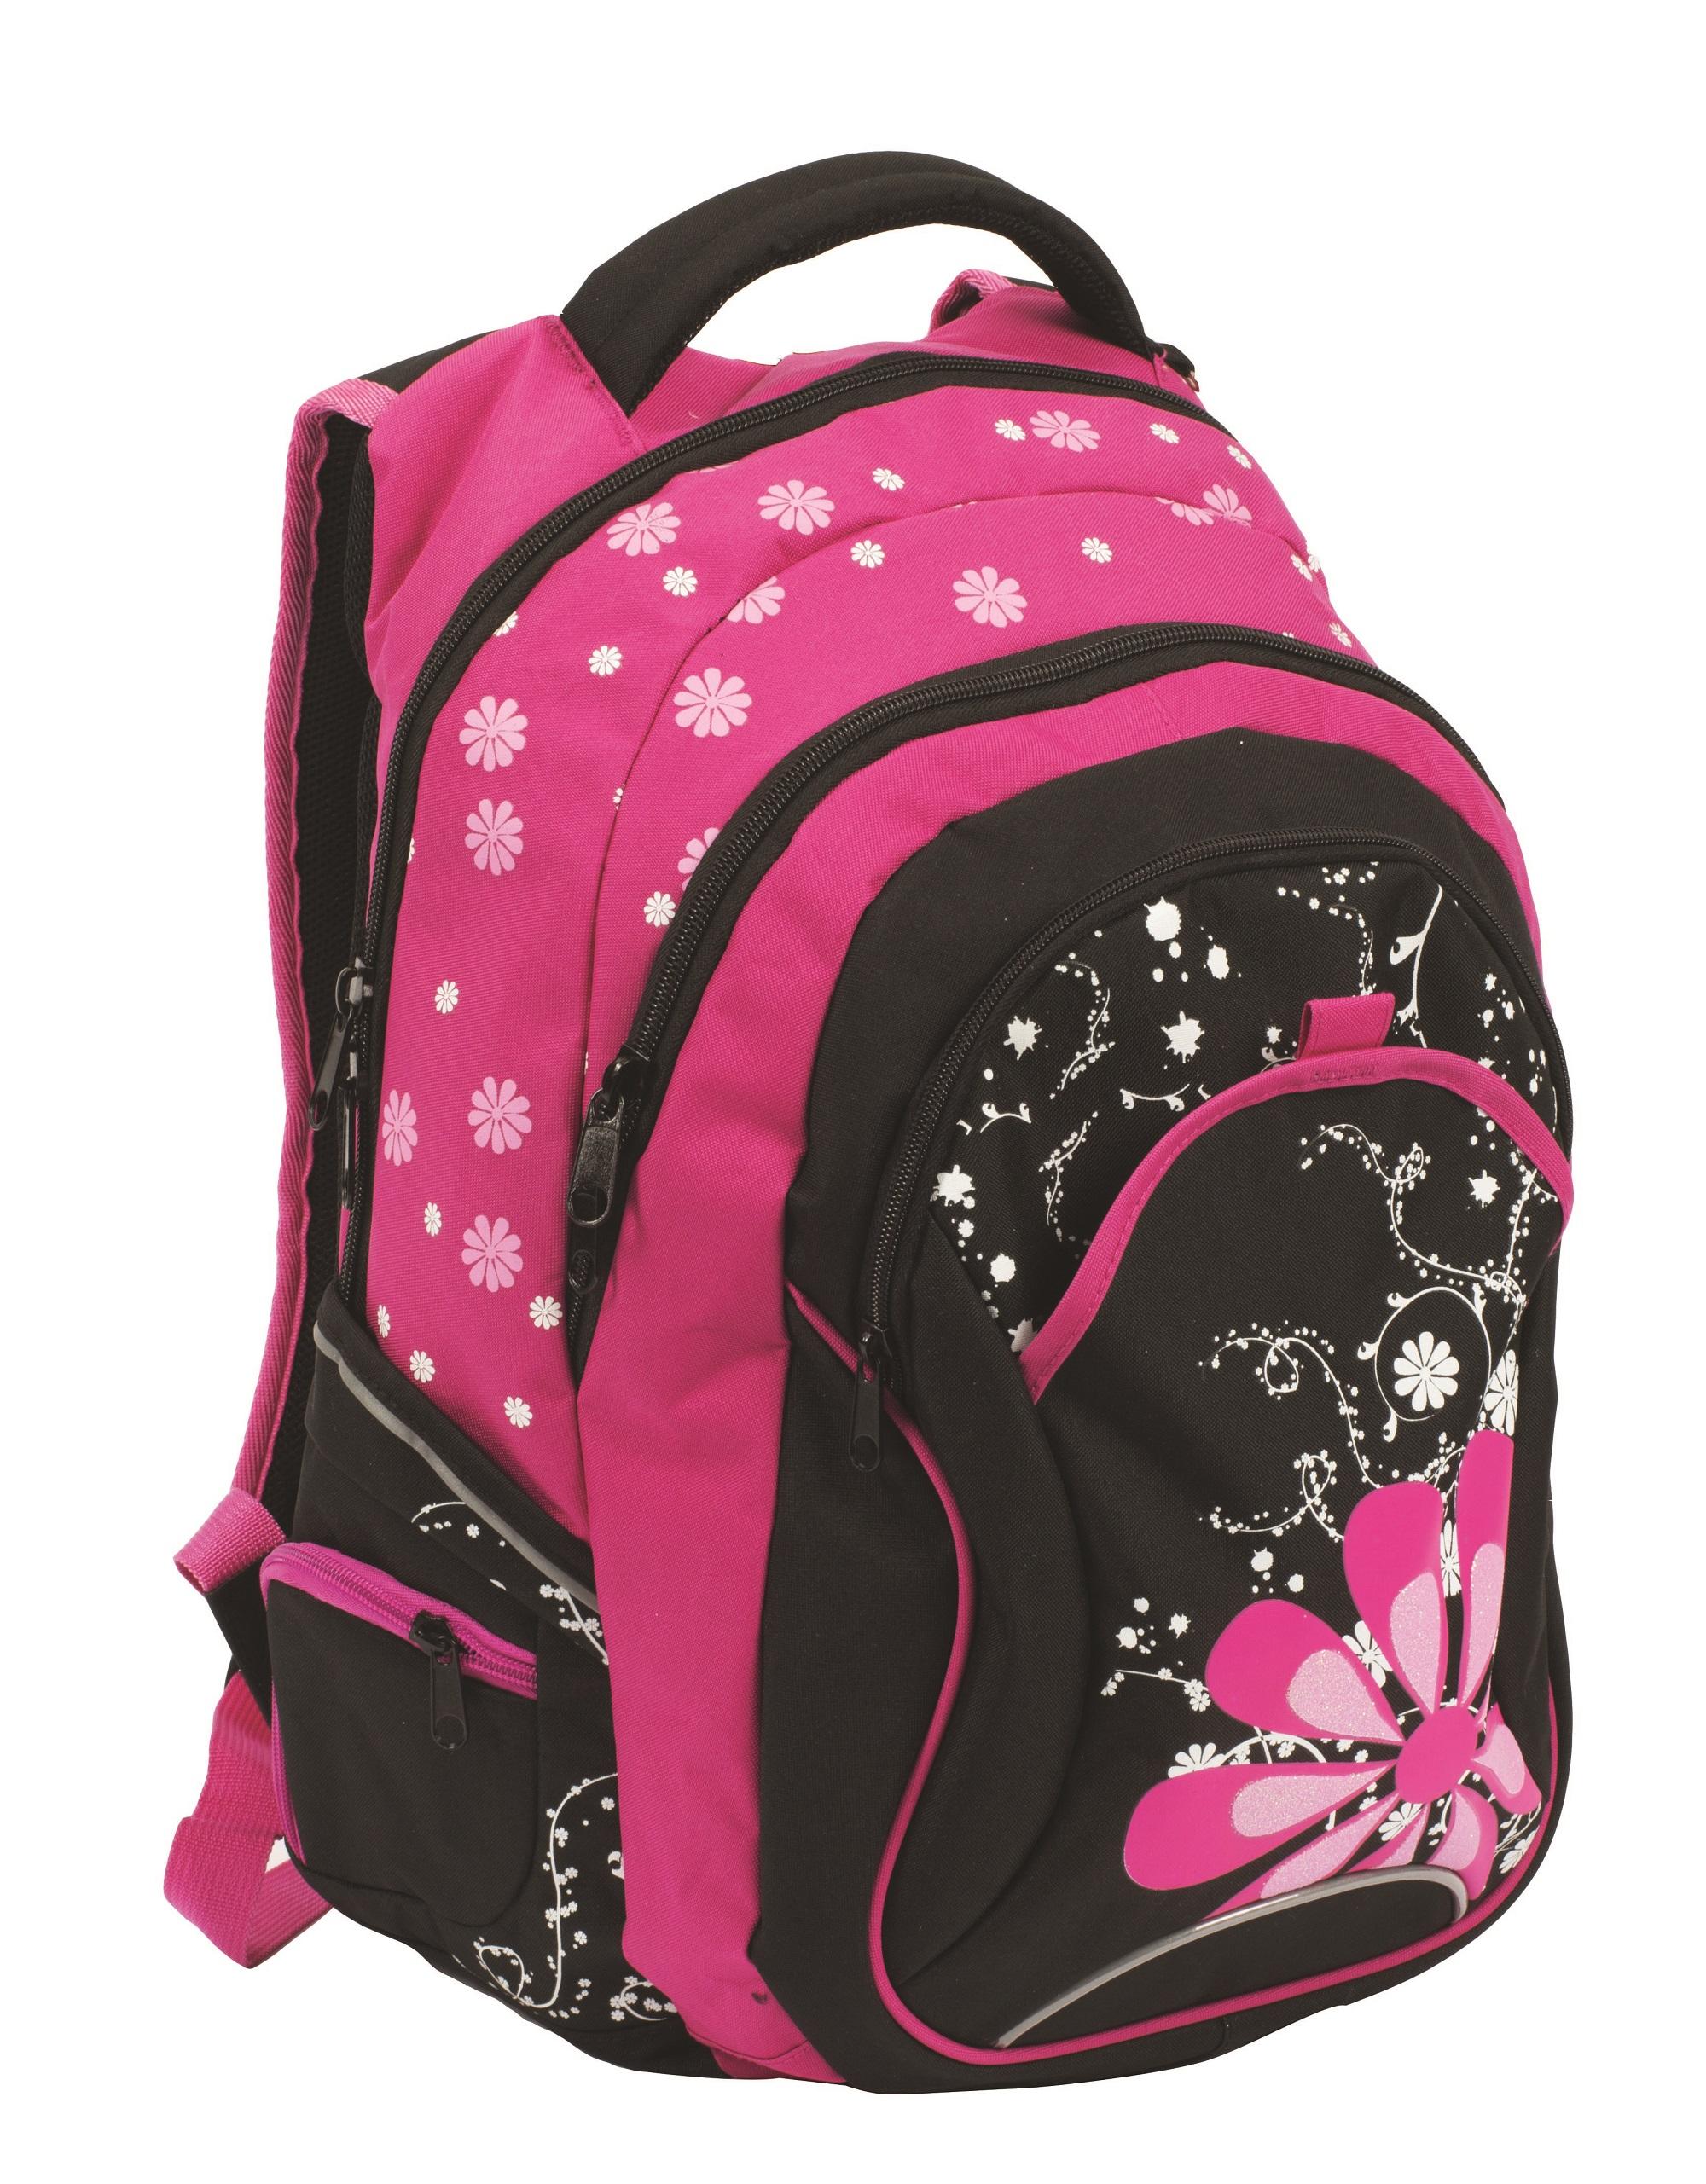 63ac2599bb Karton P+P Anatomický batoh OXY Fashion - ružový